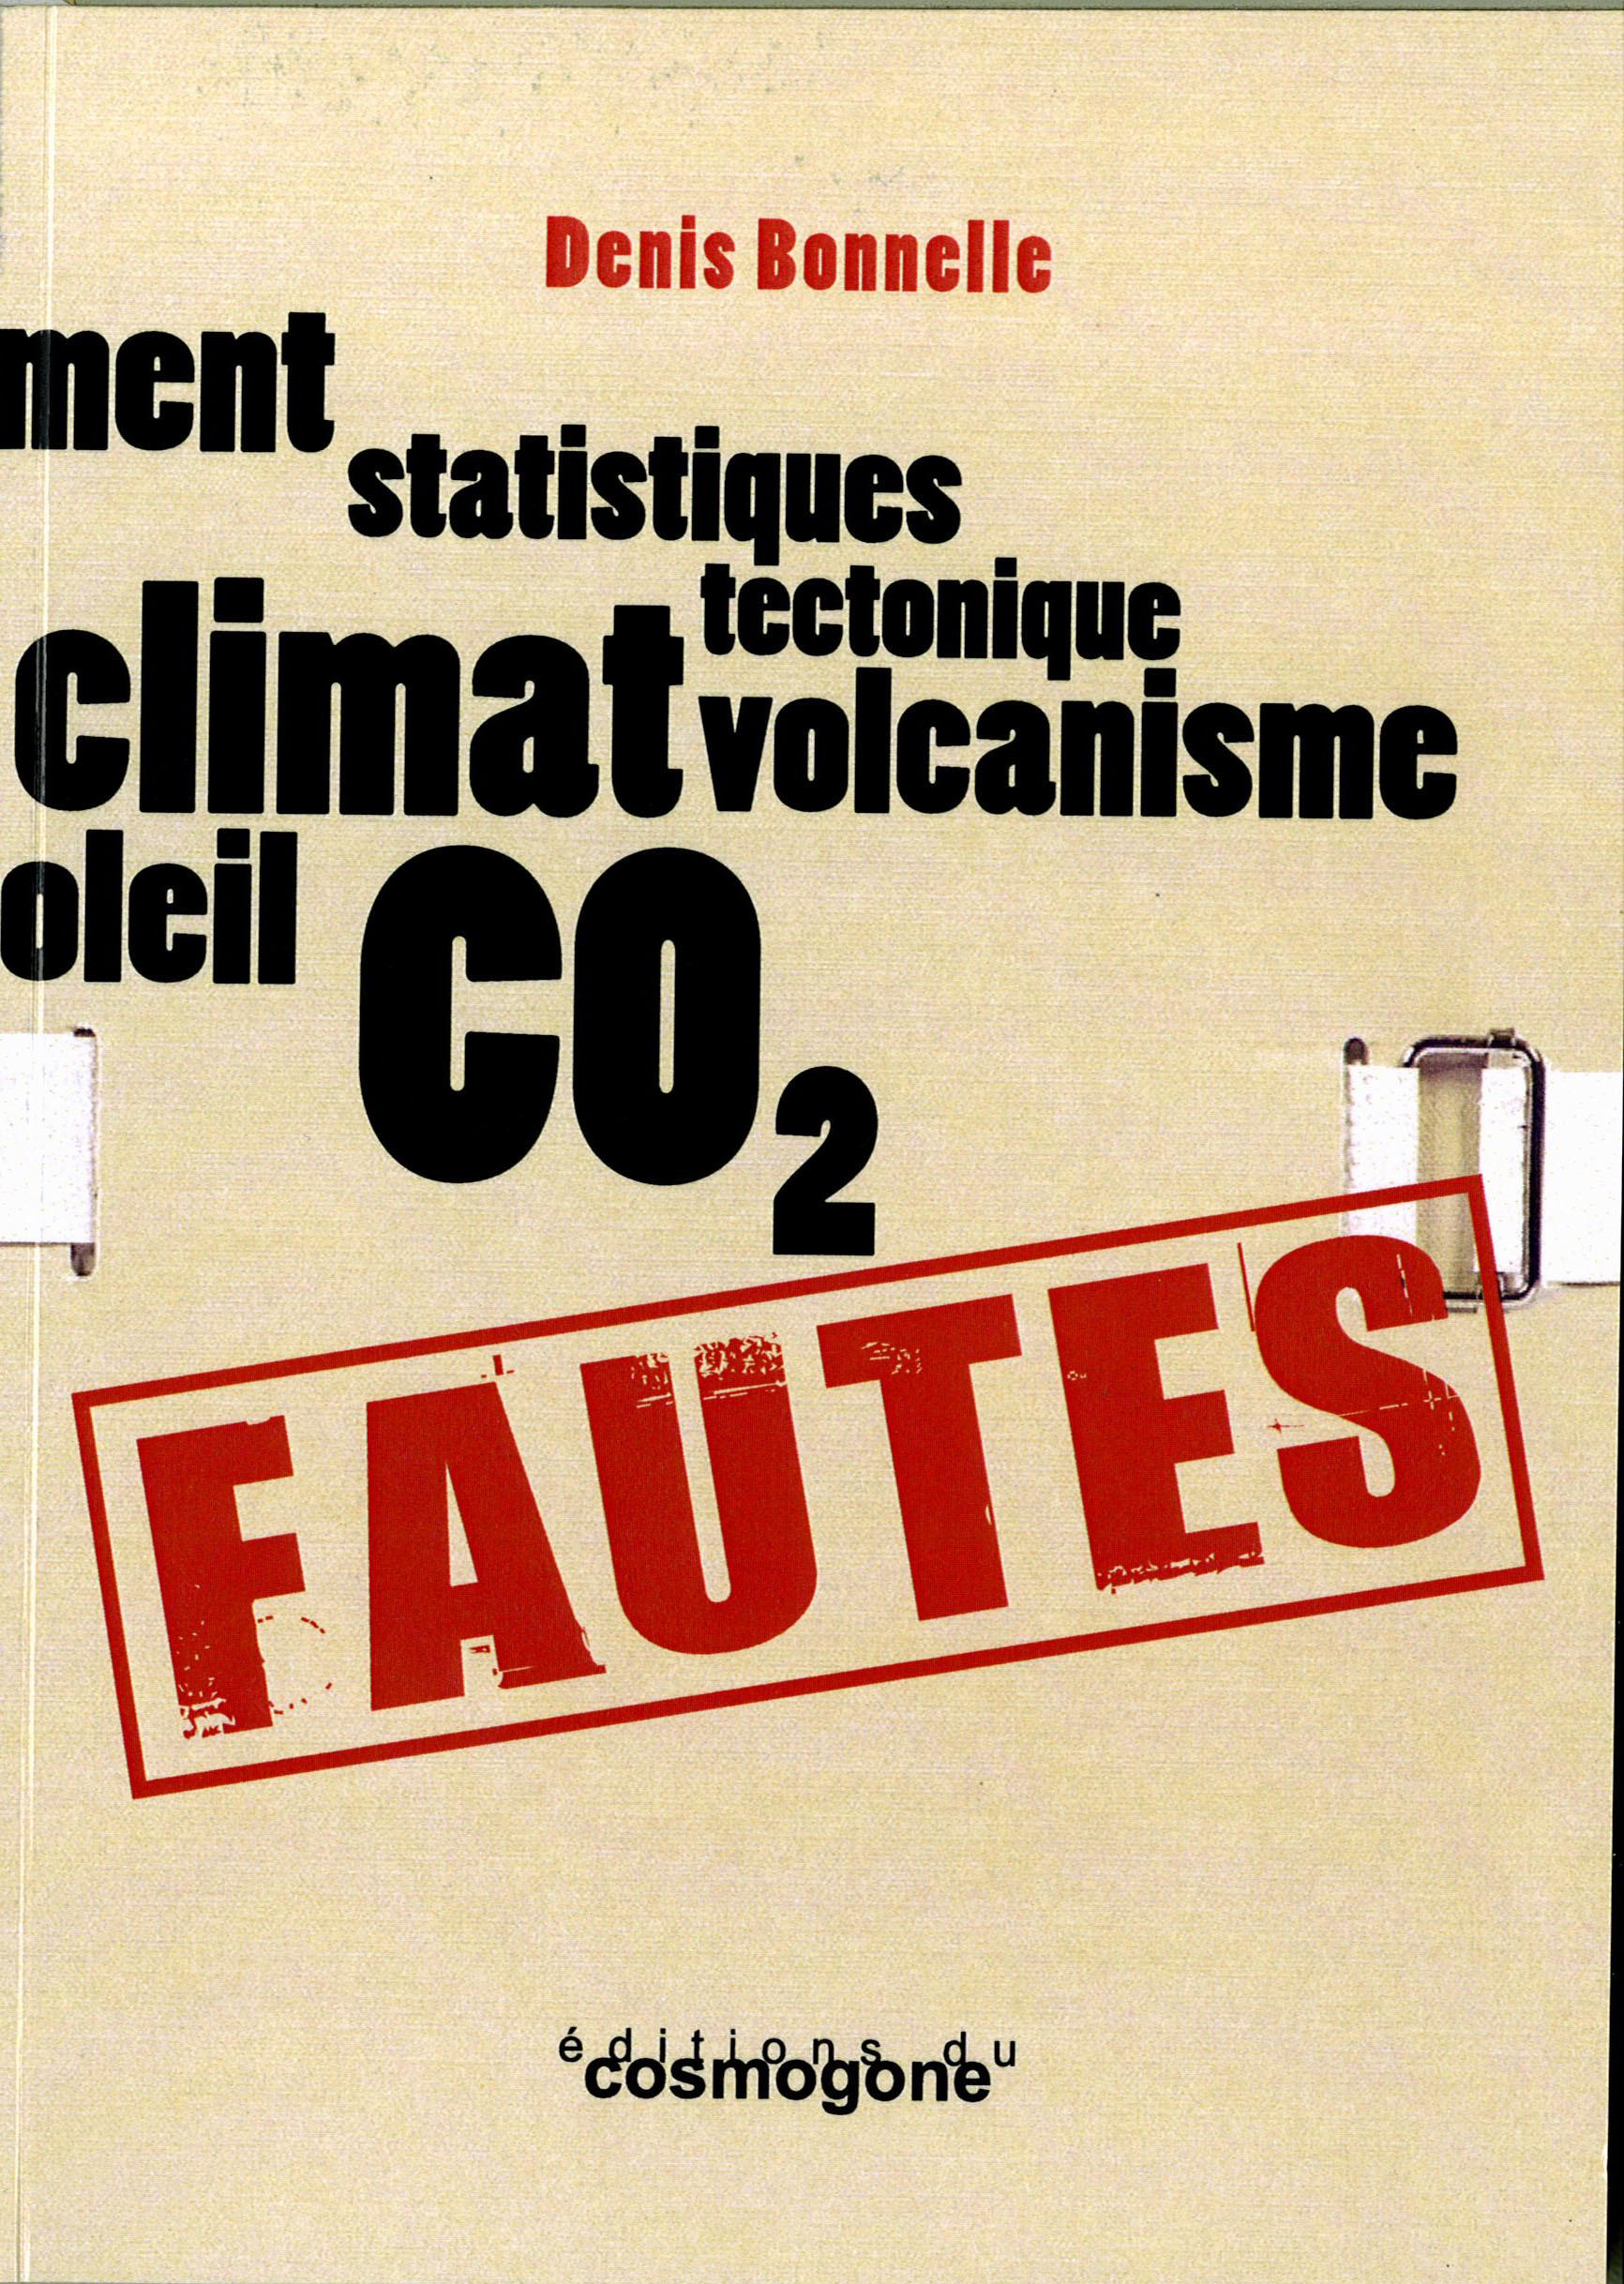 FAUTES : CLIMATOSCEPTICISME, IMCOMPETENCE ET IRRESPONSABLITE